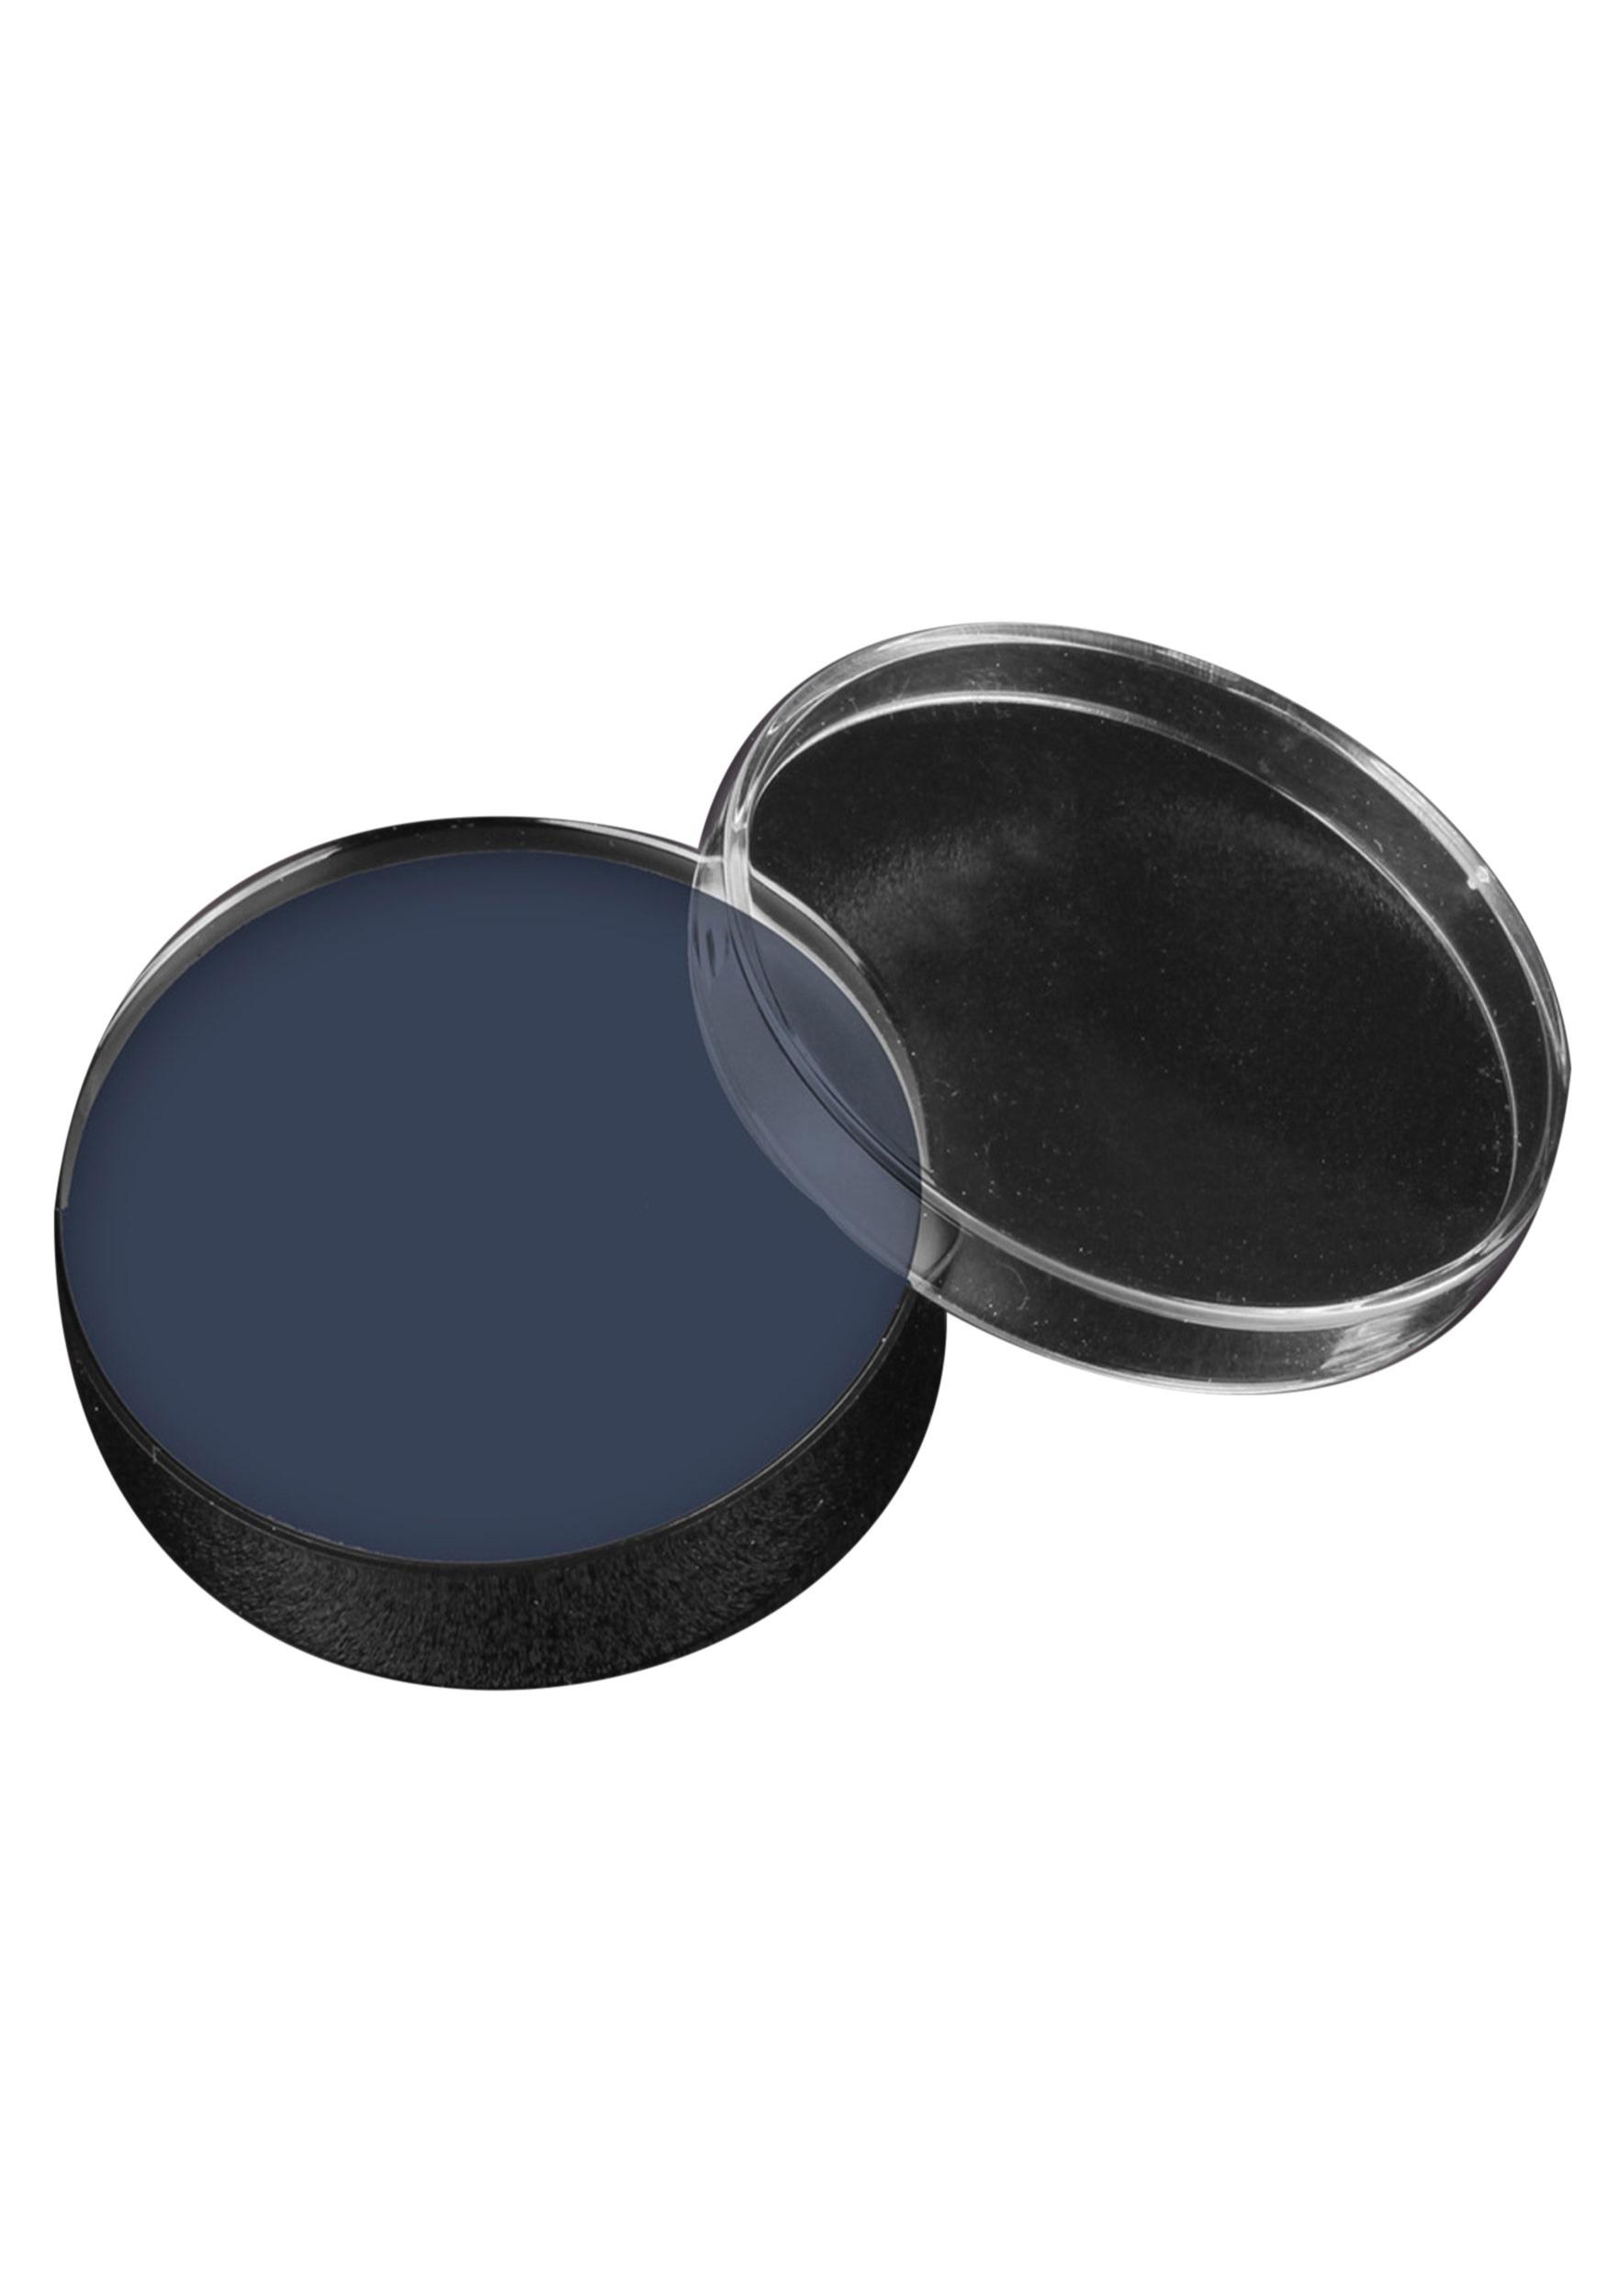 Mehron Premium Monster Grey Greasepaint Makeup 0.5 oz